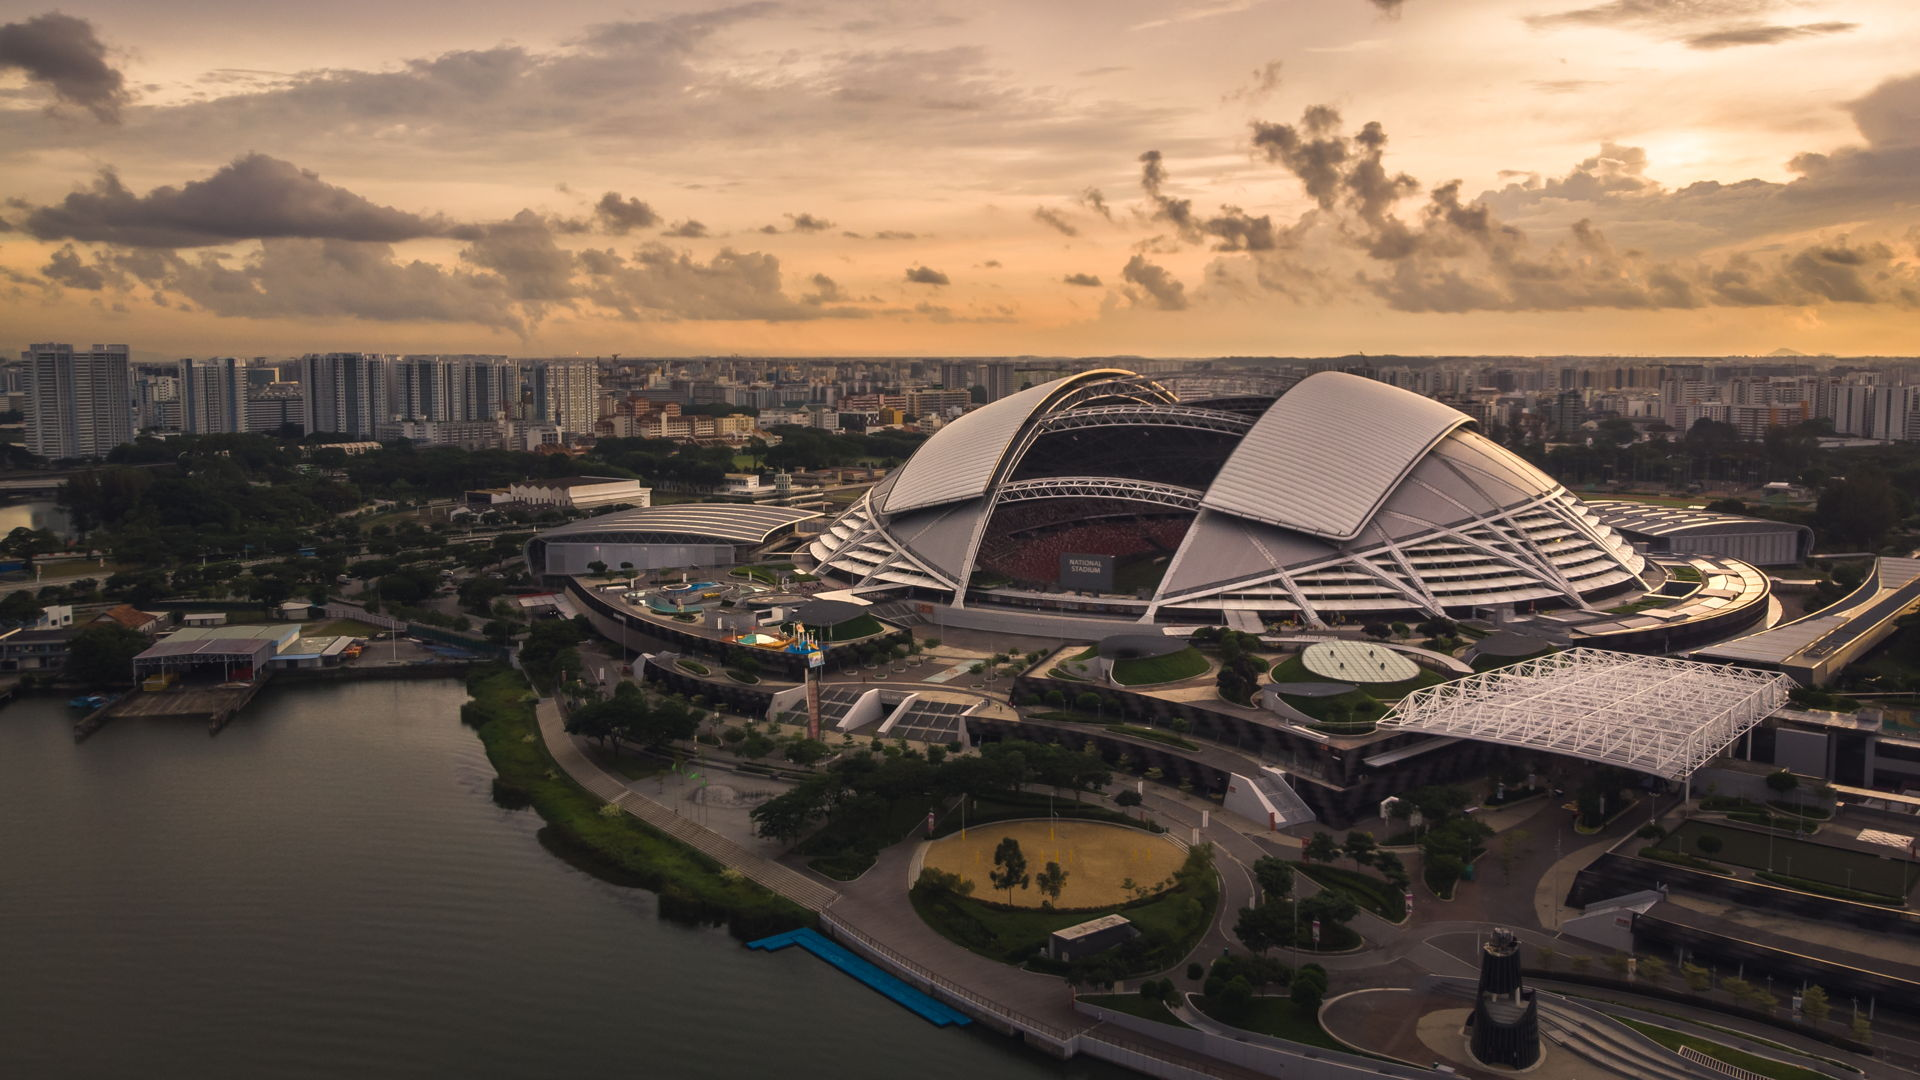 national stadium of singapore, singapore stadium drone, aerial view of national stadium of singapore, sunrise singapore stadium, drone sunrise national stadium singapore, stadium aerial, drone stadium, drone singapore, where to fly drone at singapore, singapore drone guidelines, best drone places singapore, singapore laws, singapore regulations